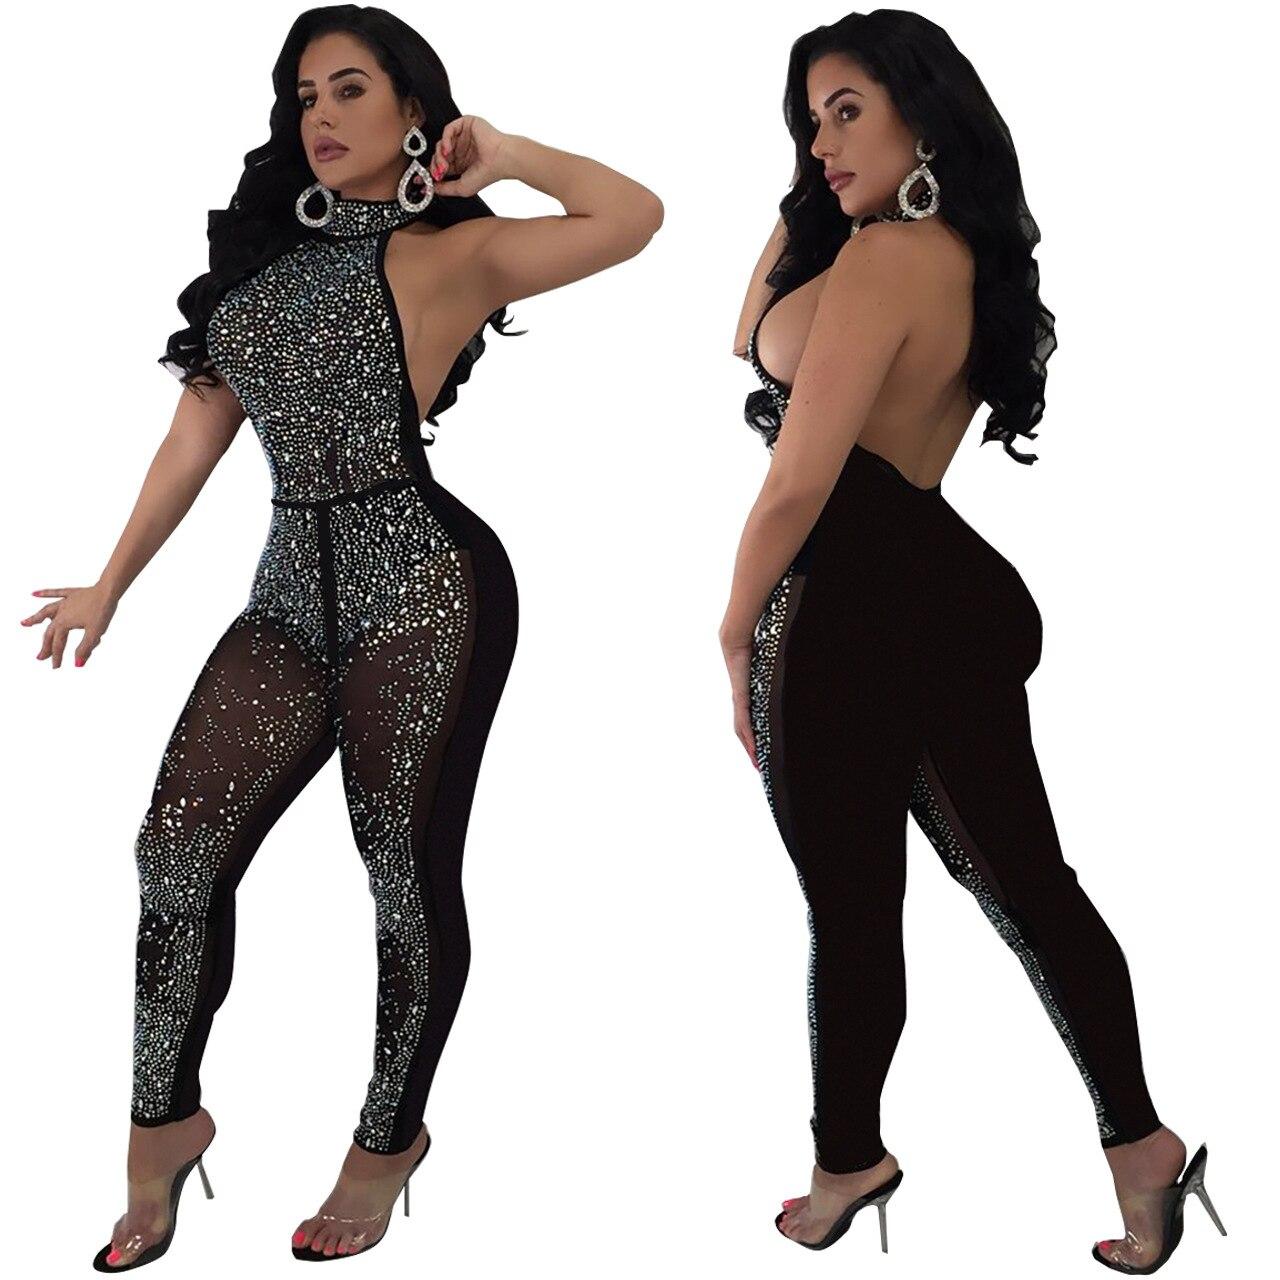 Female Backless Halter Stretch Shining Black Jumpsuit Mesh Wear Sleeveless Bodysuit Party Sexy Women Crystals Club Q144 qBaw0wY